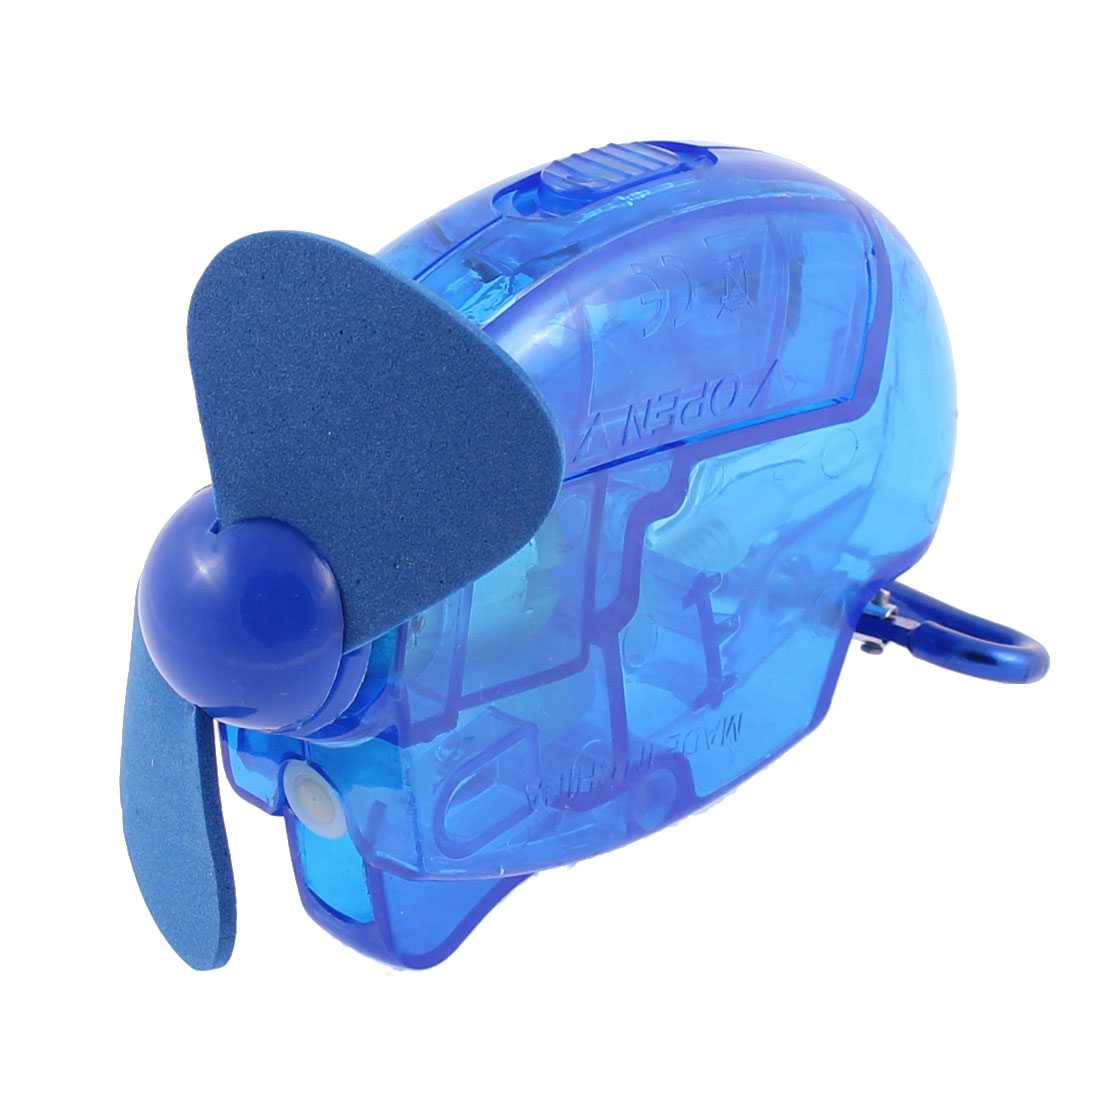 Mini Portable Handheld Outdoor Sport Water Cooling Cooler Spray Fan Mist Gadget